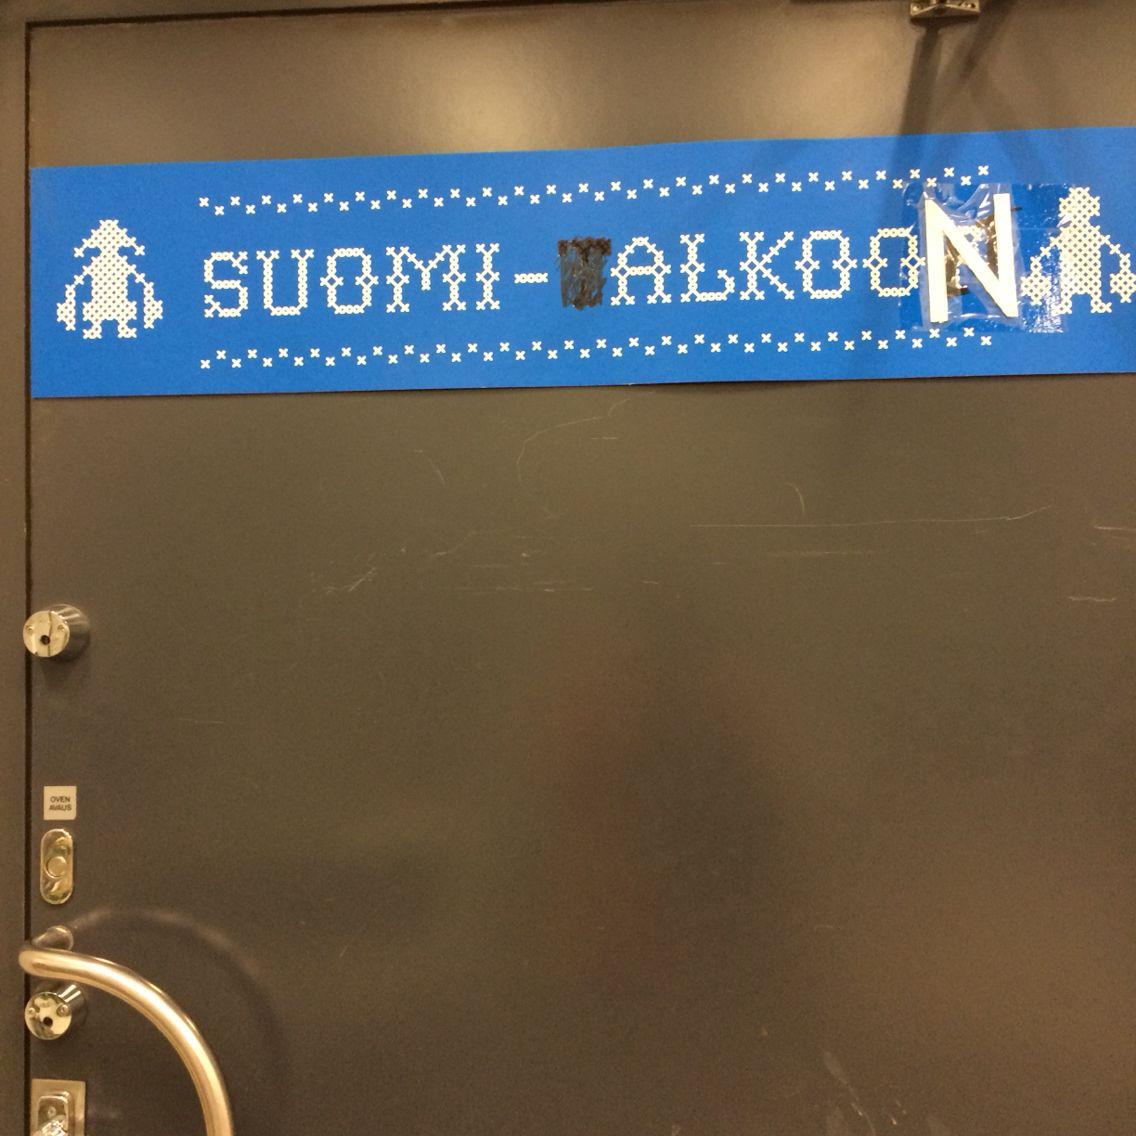 Suomi alkooon... Eiku?